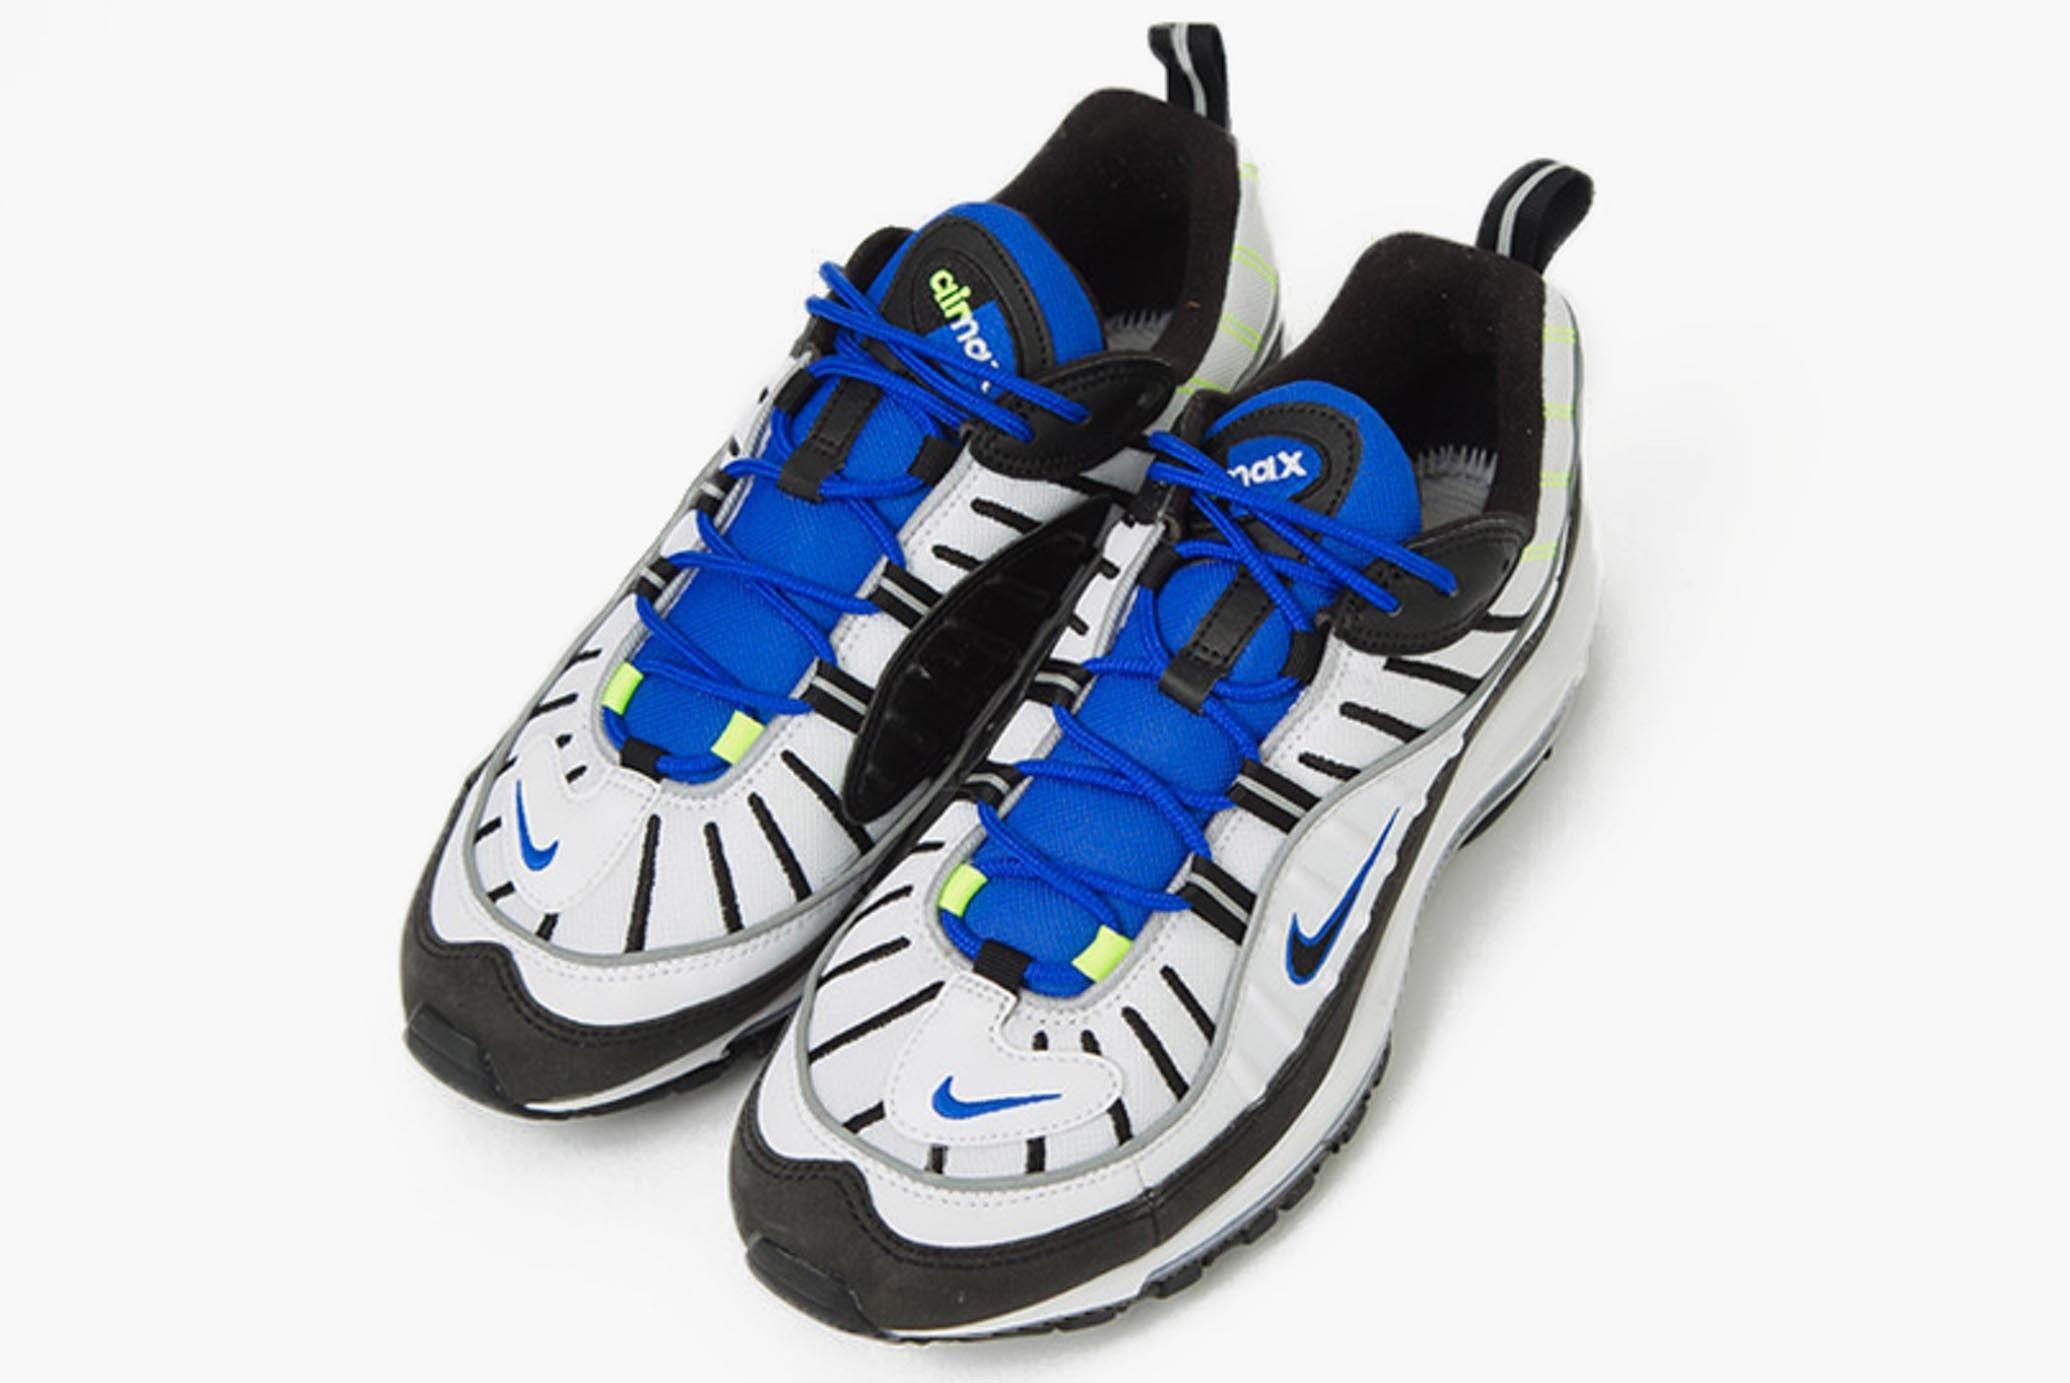 Nike Air Max 98 Racer Blue Release Info 001 Sneaker Freaker